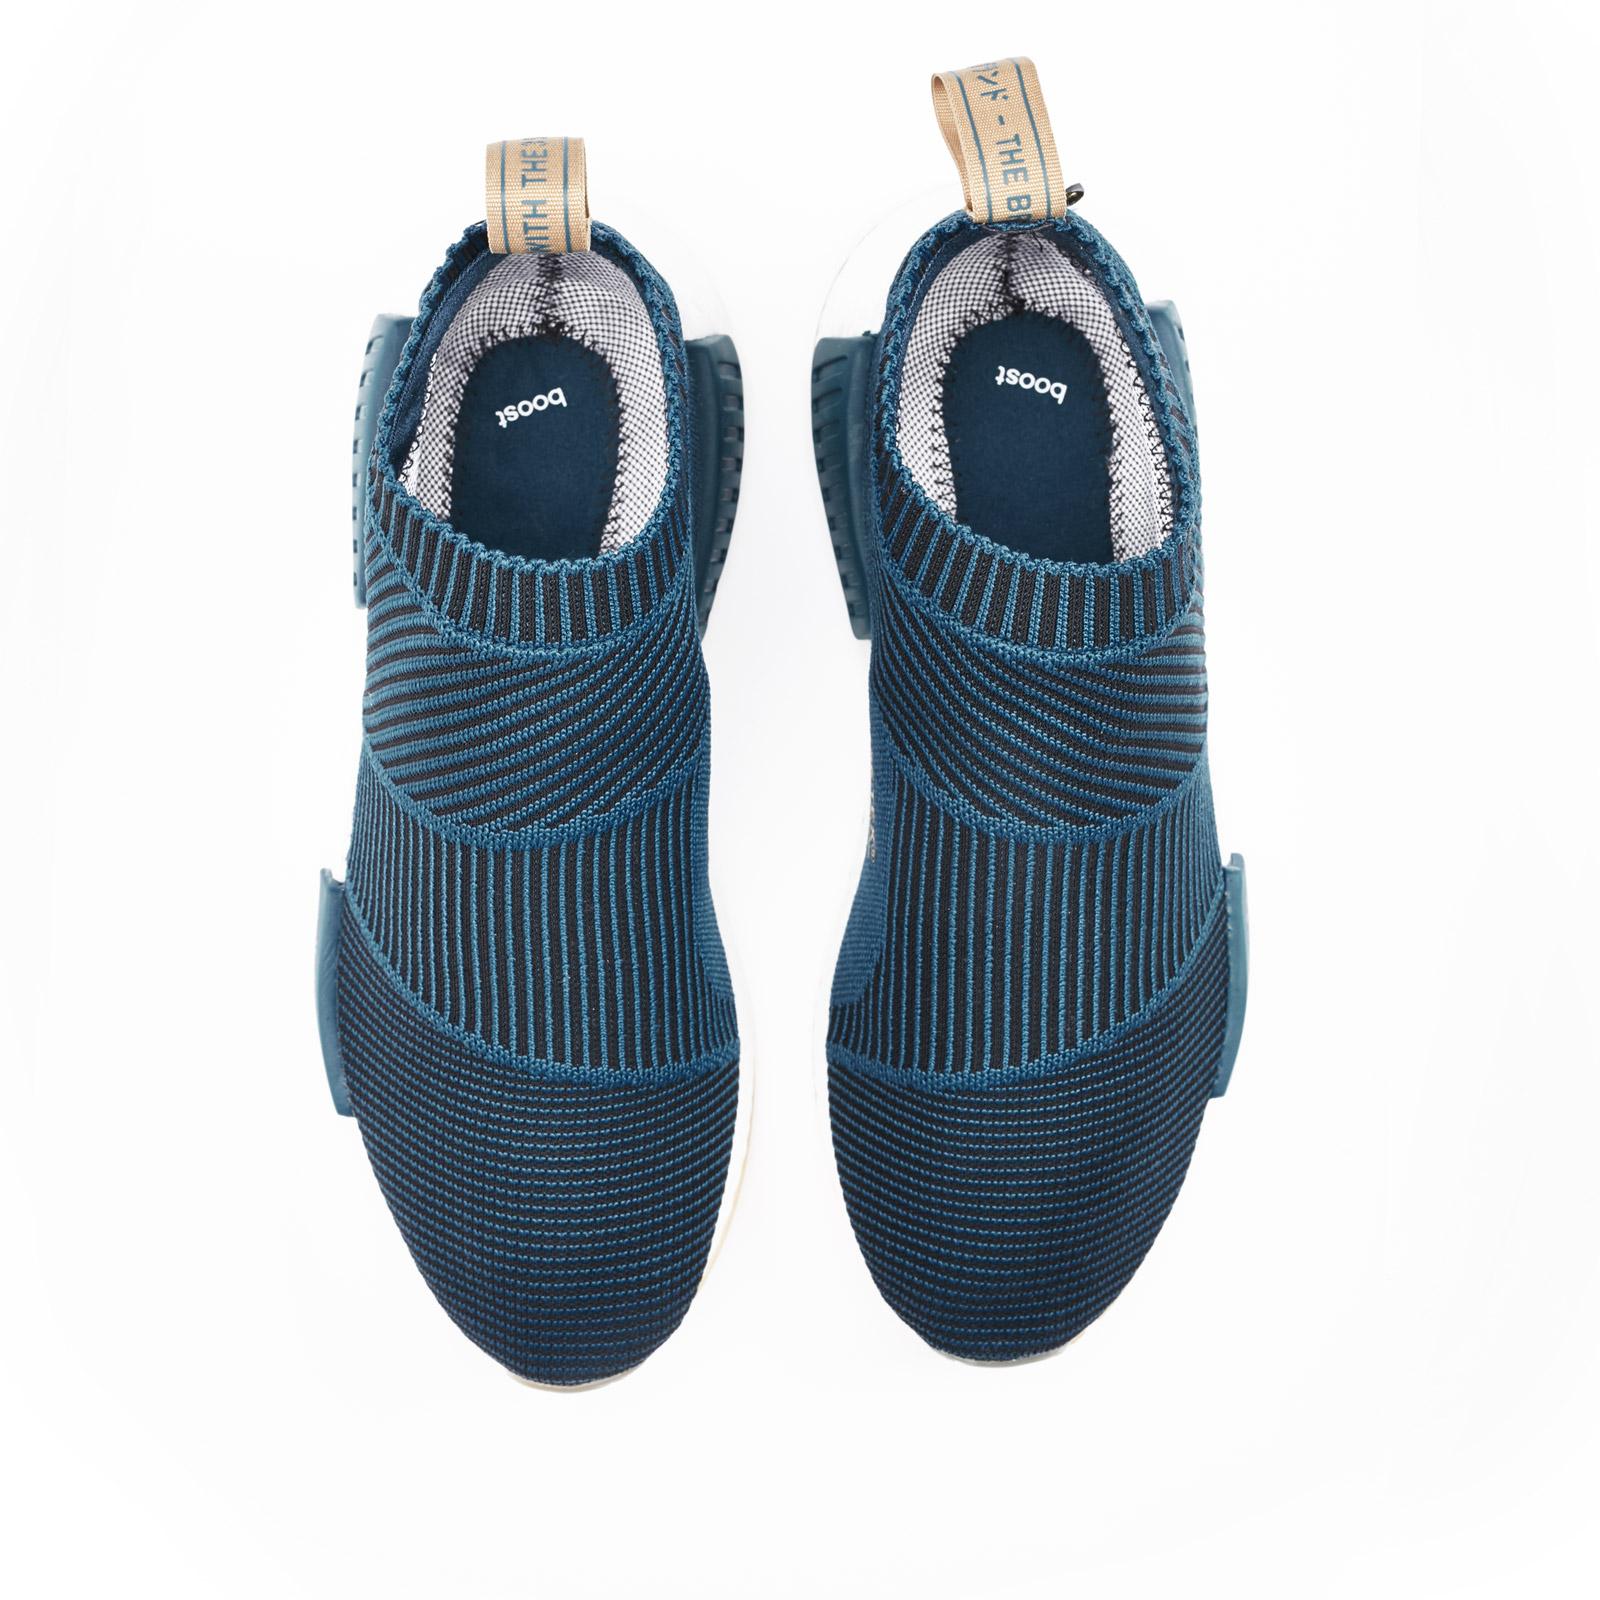 super popular 38141 fabef ... adidas Originals NMD CS1 GORE-TEX Primeknit - SNS Exclusive ...